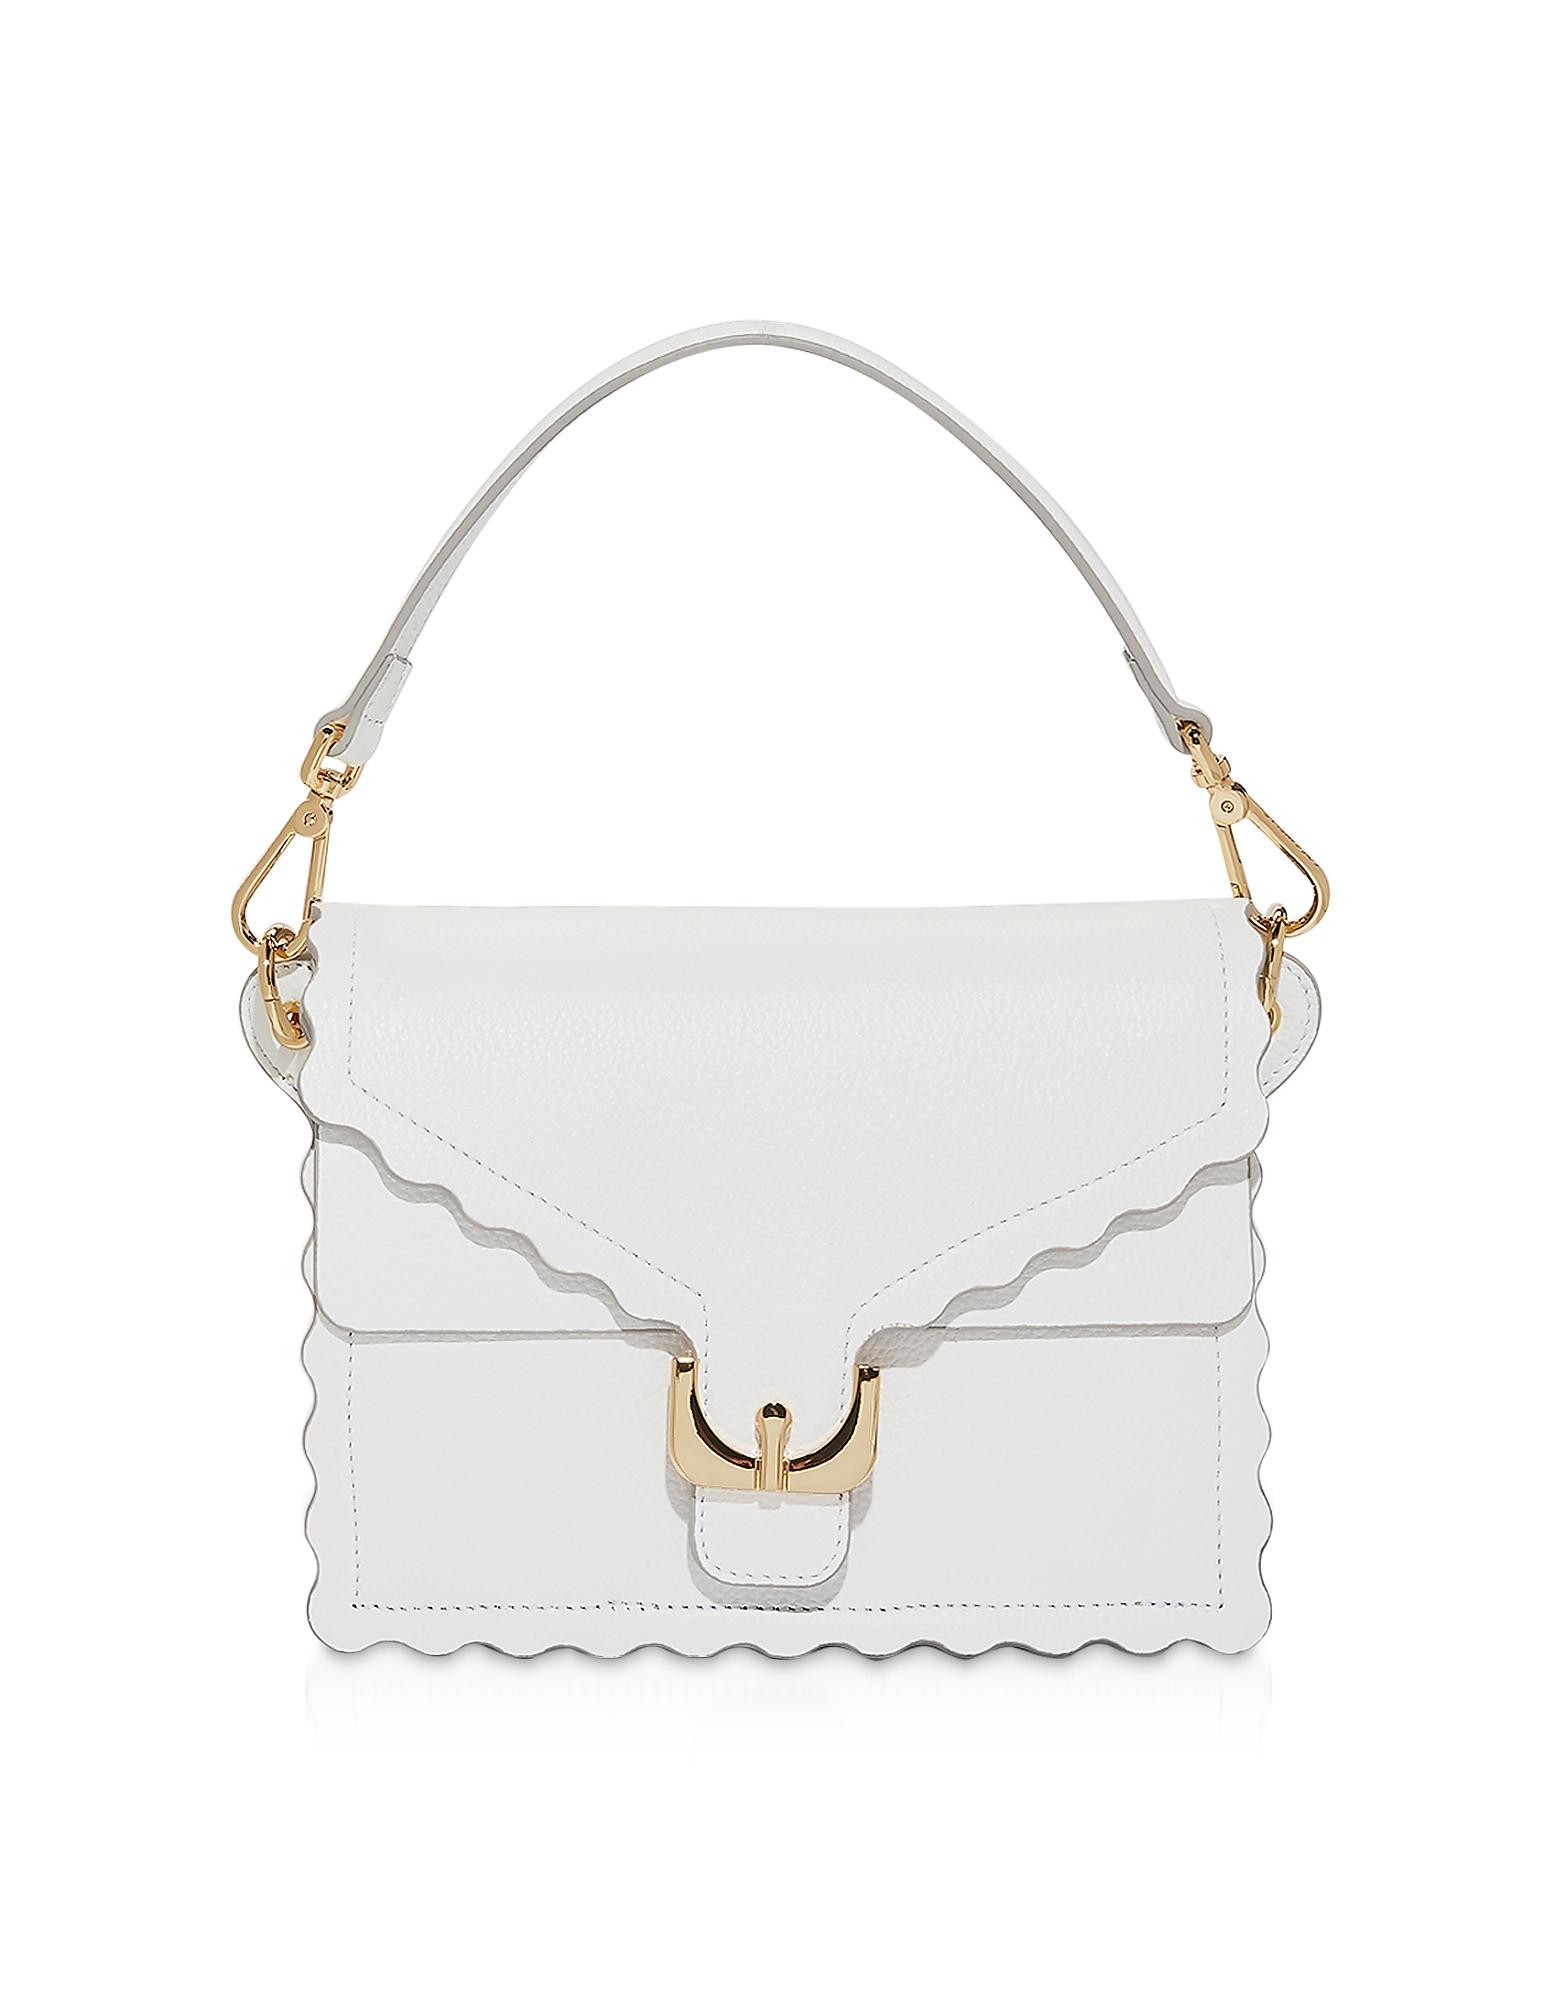 Ambrine Merletto White Leather Shoulder Bag